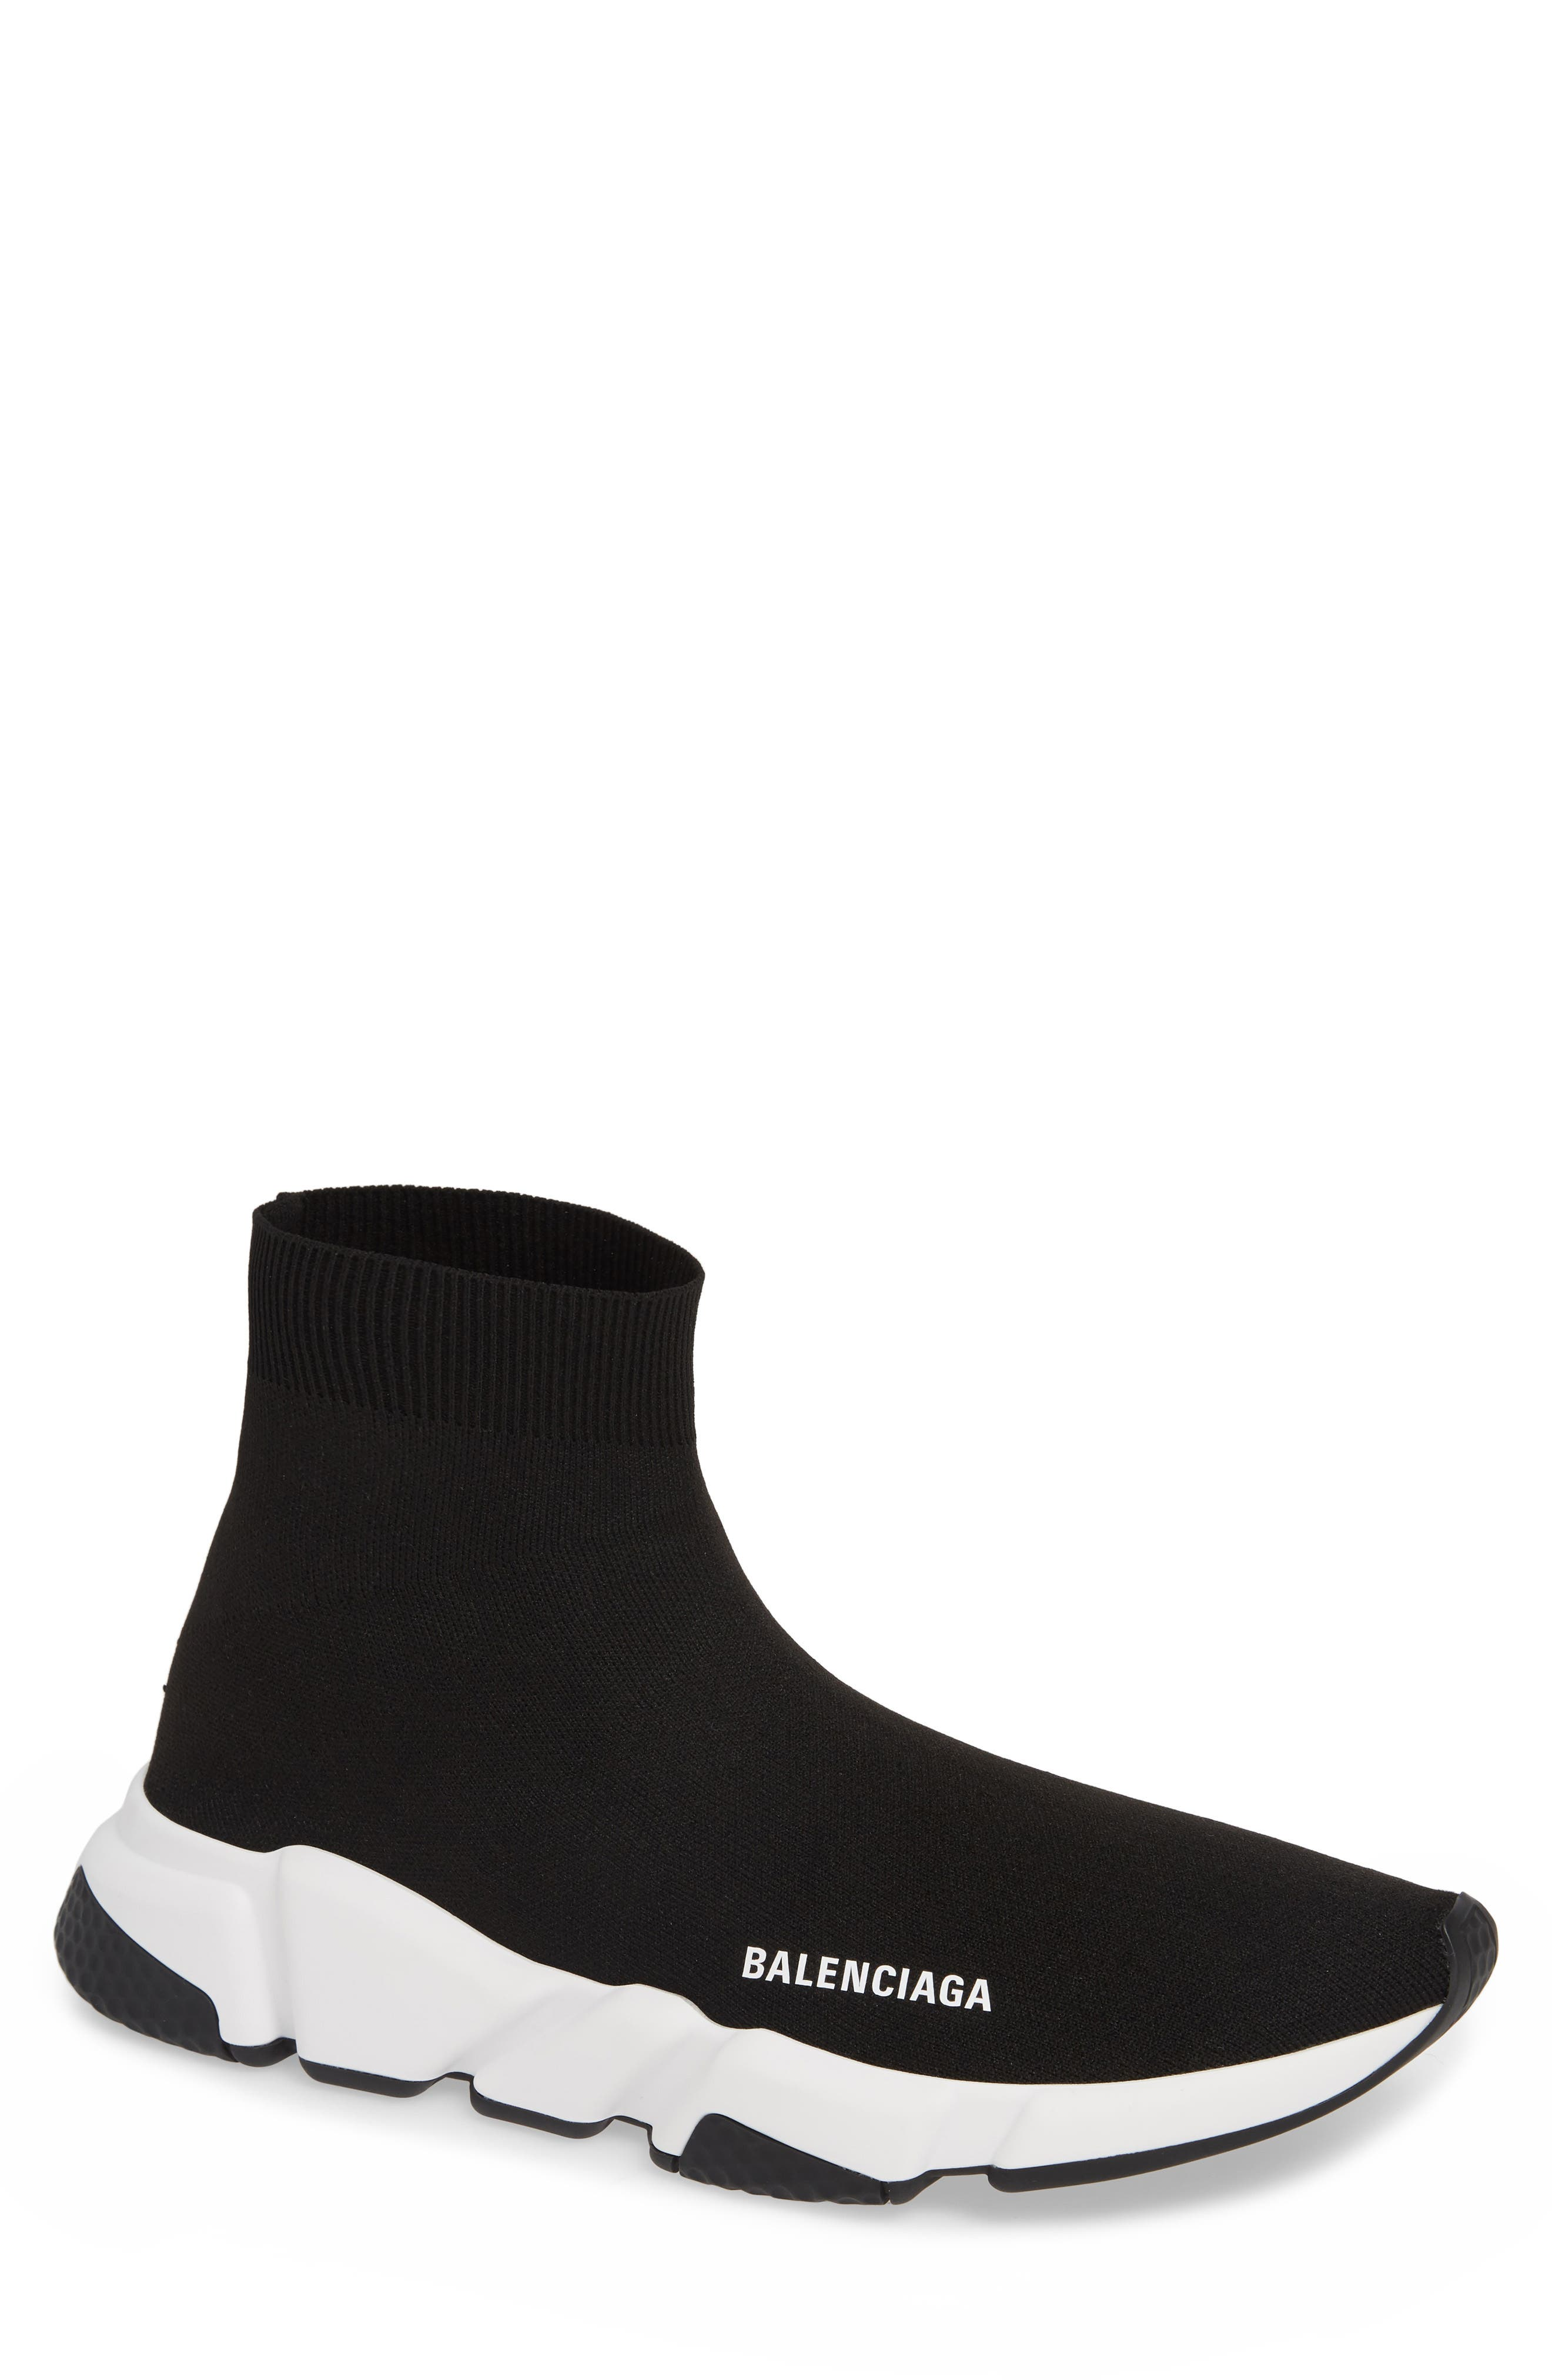 d5c99ce0f3f0ce Men s Balenciaga Shoes